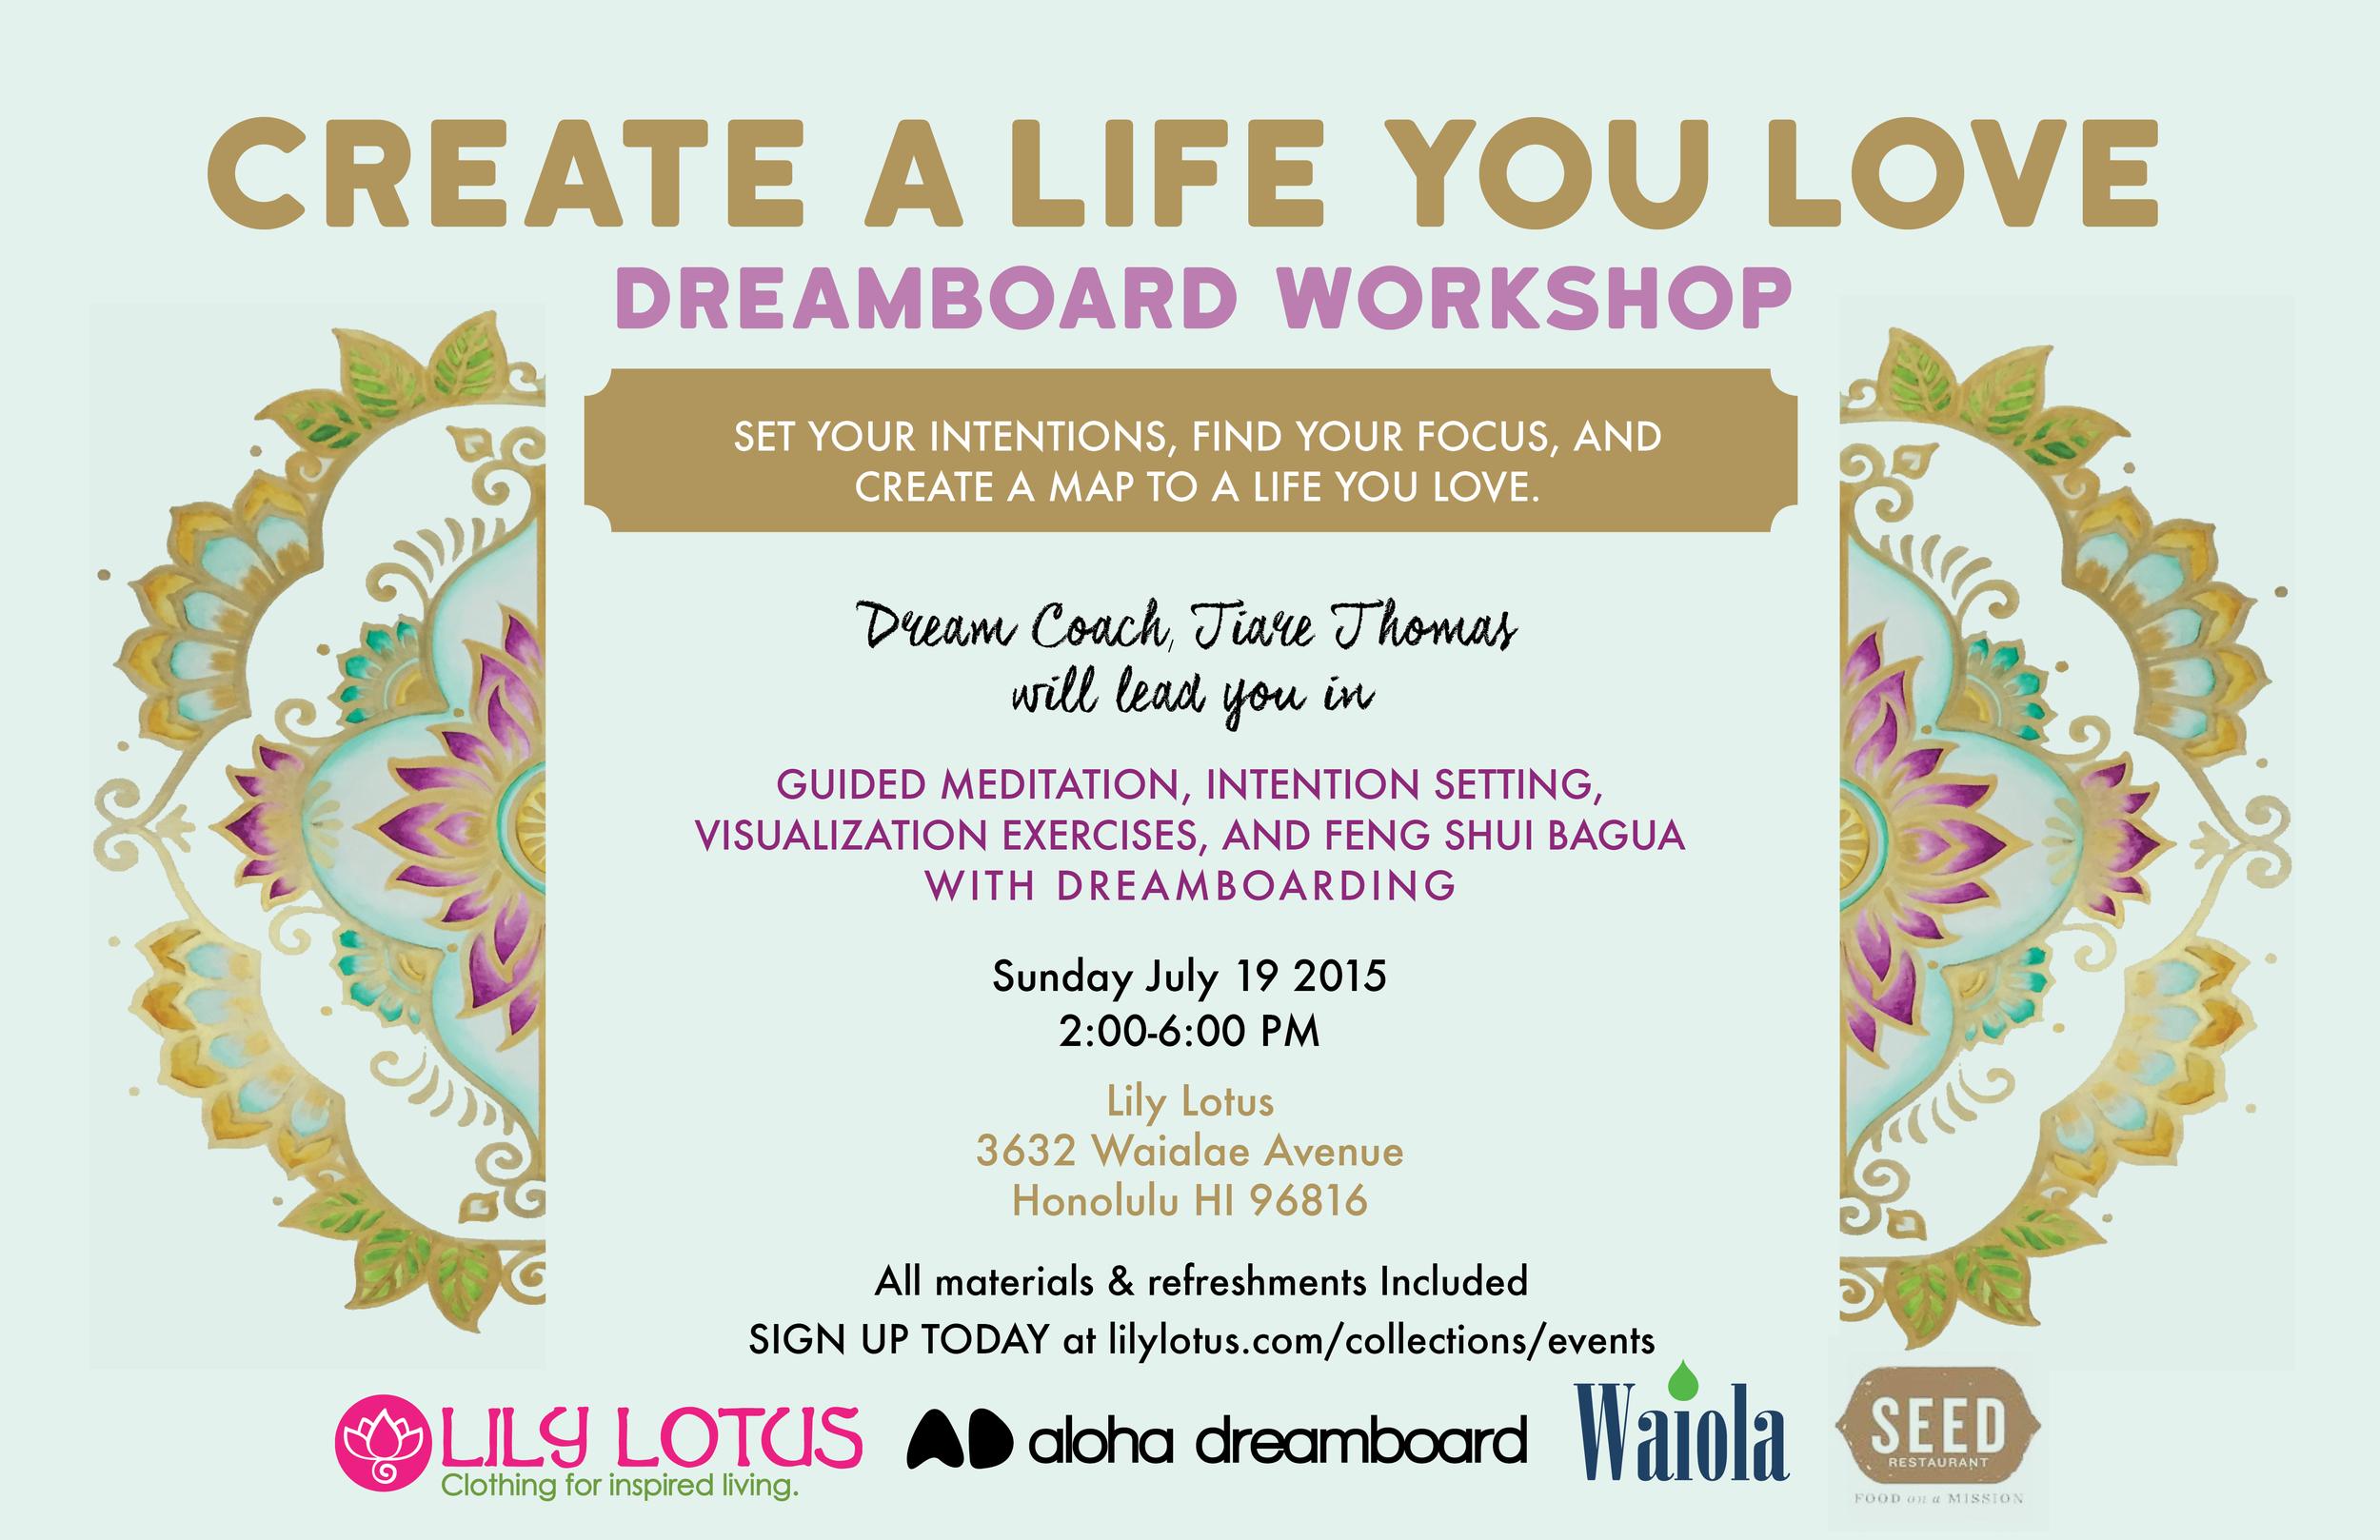 Create_A_Life_You_Love_Dreamboard_Workshop_Aloha_Dreamboard_Lily_Lotus_July_19th_2015